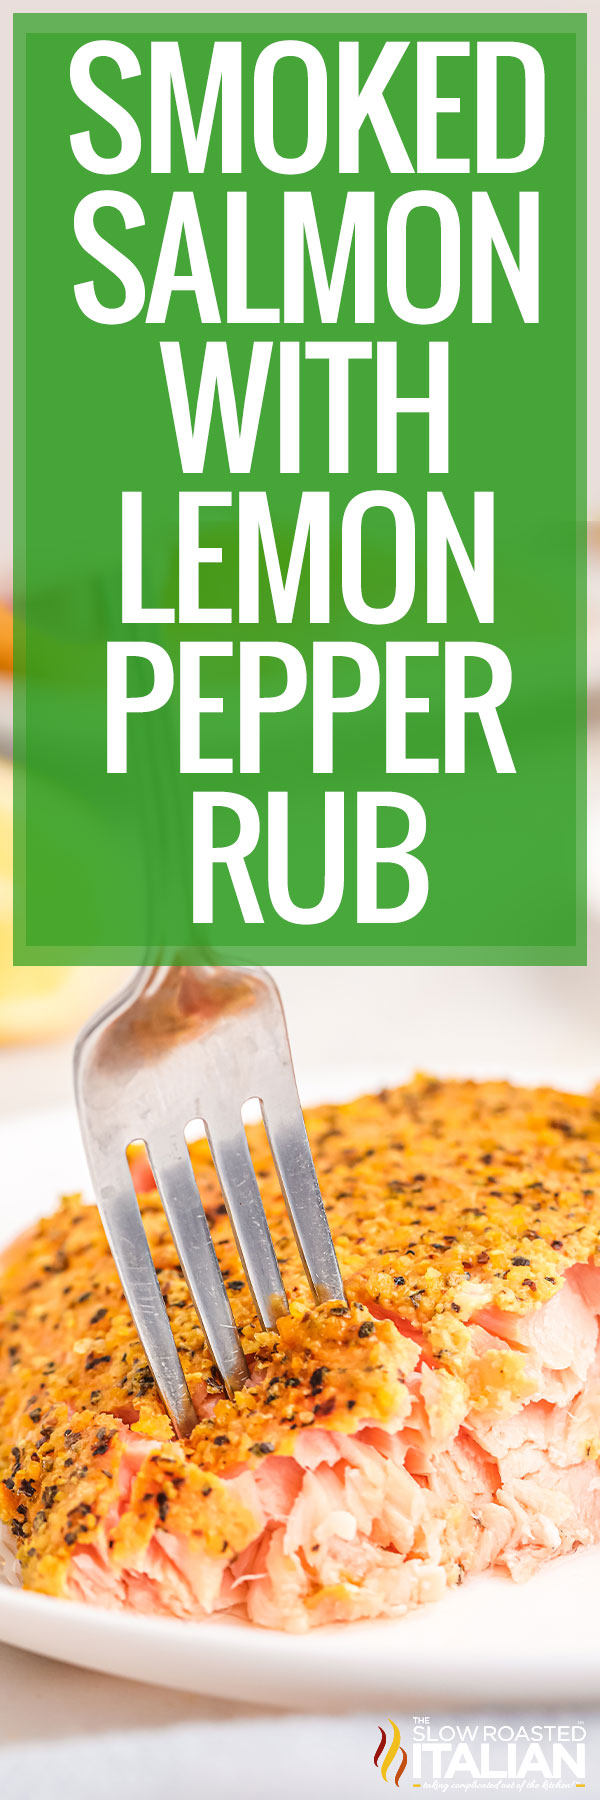 Smoked Salmon with Lemon Pepper Rub close up